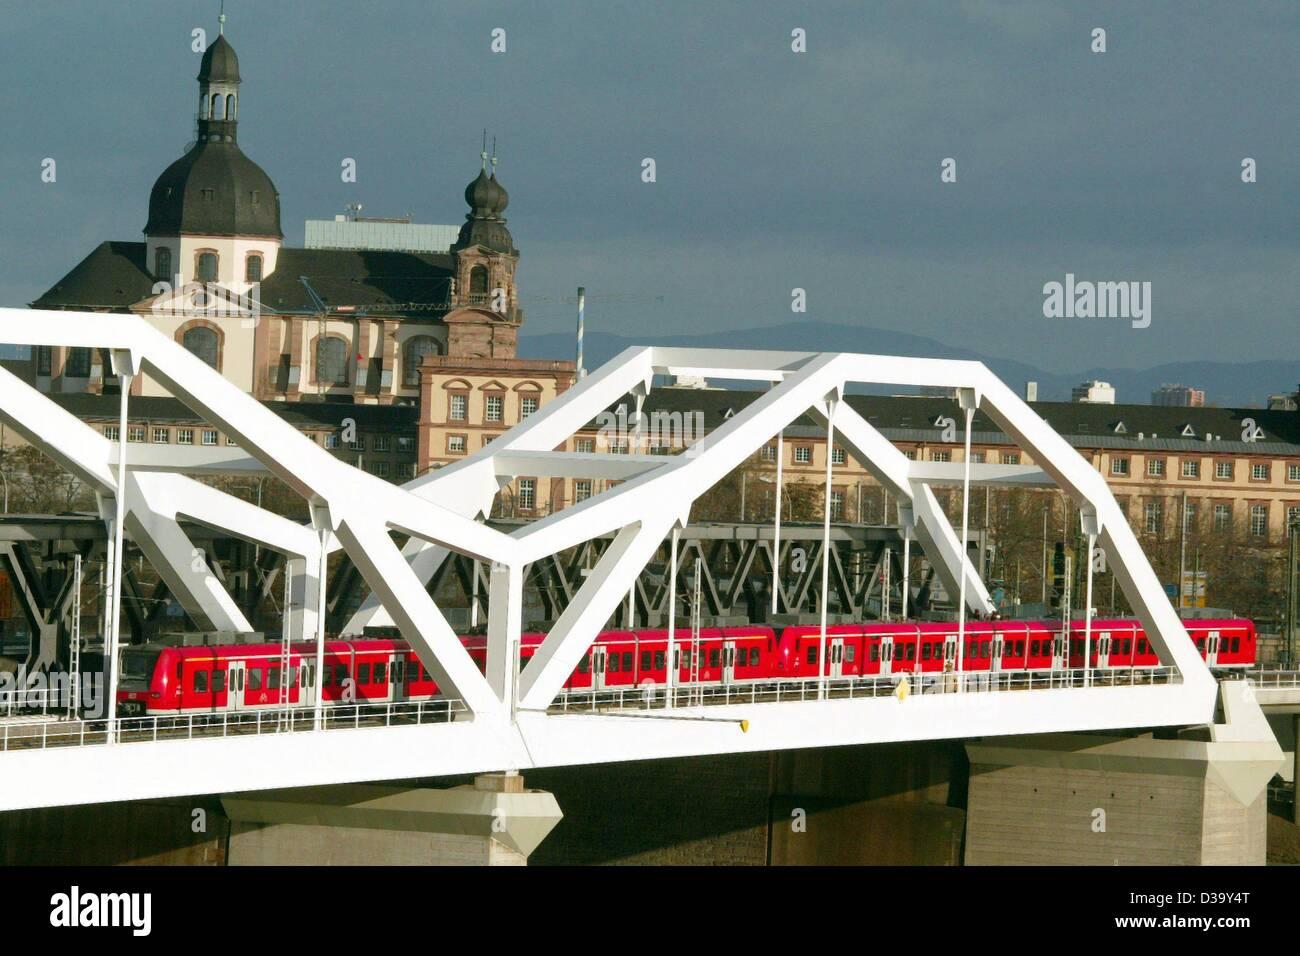 (dpa) - A S-Bahn service crosses the railway bridge across the River Rhine between Ludwigshafen and Mannheim, Germany, Stock Photo